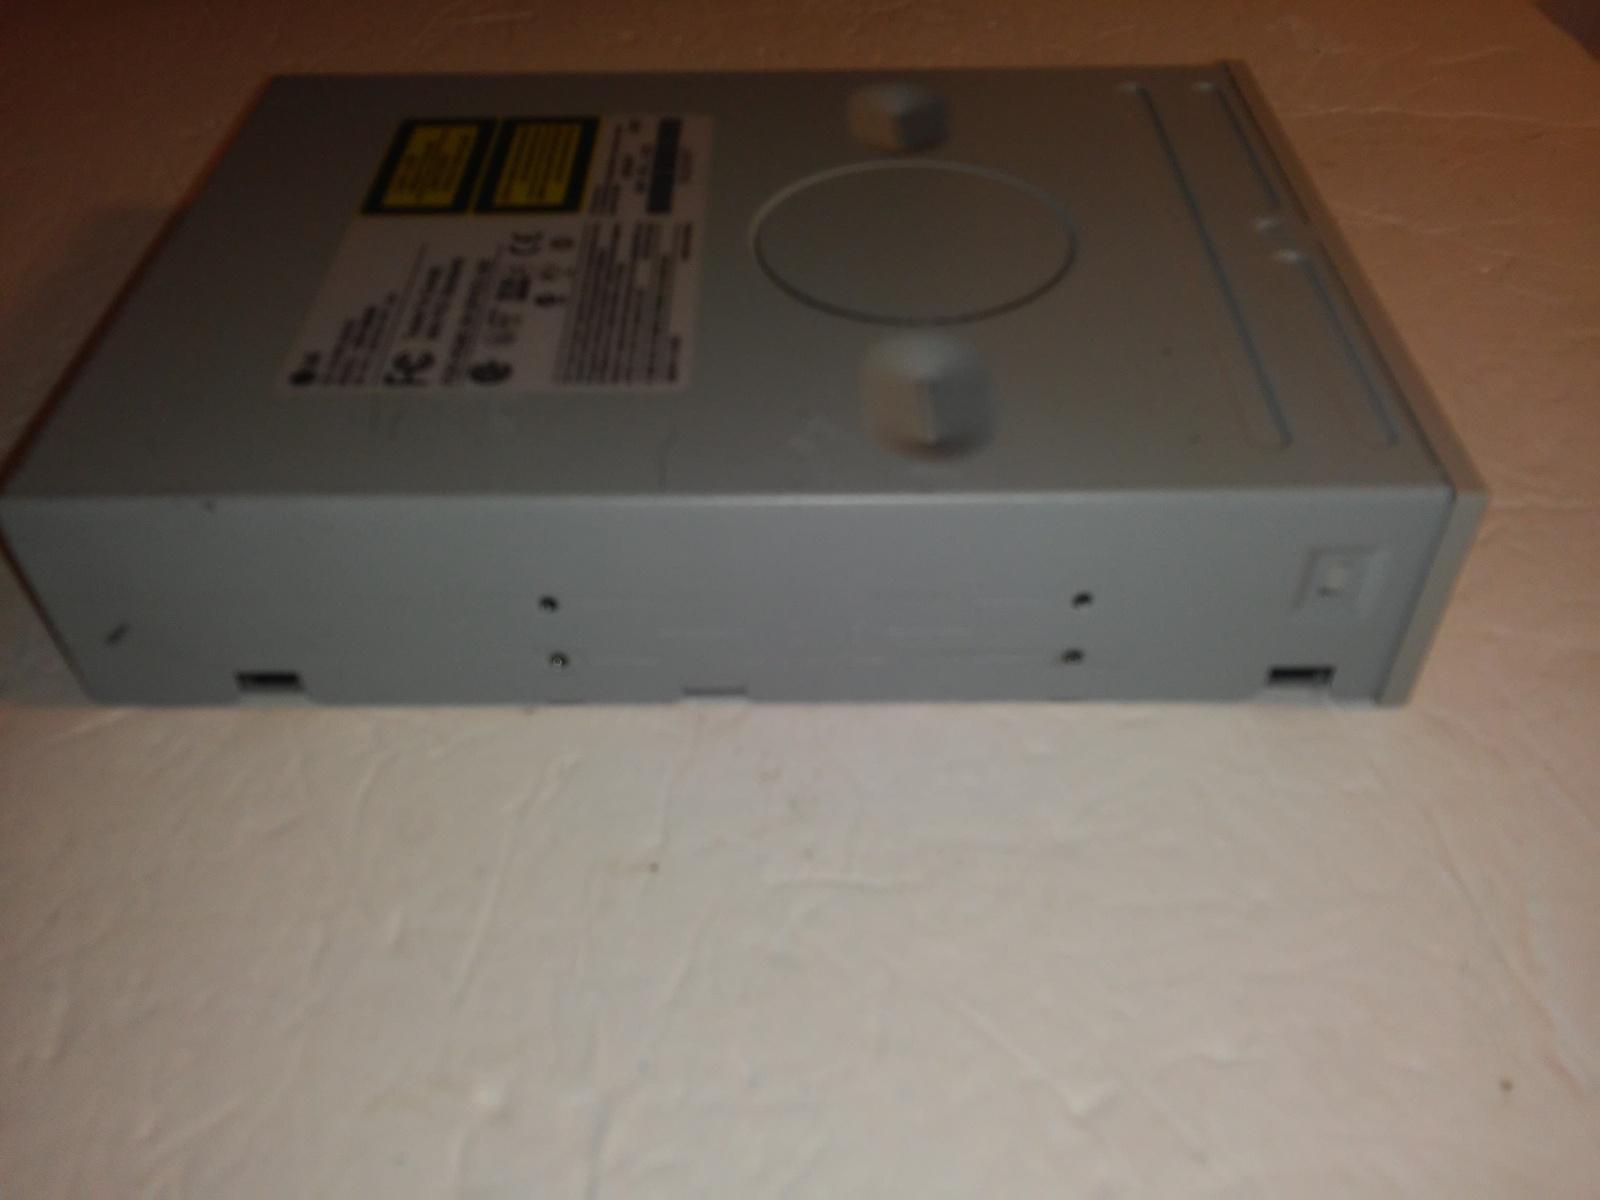 LG CD-RW CED8080B DRIVER DOWNLOAD